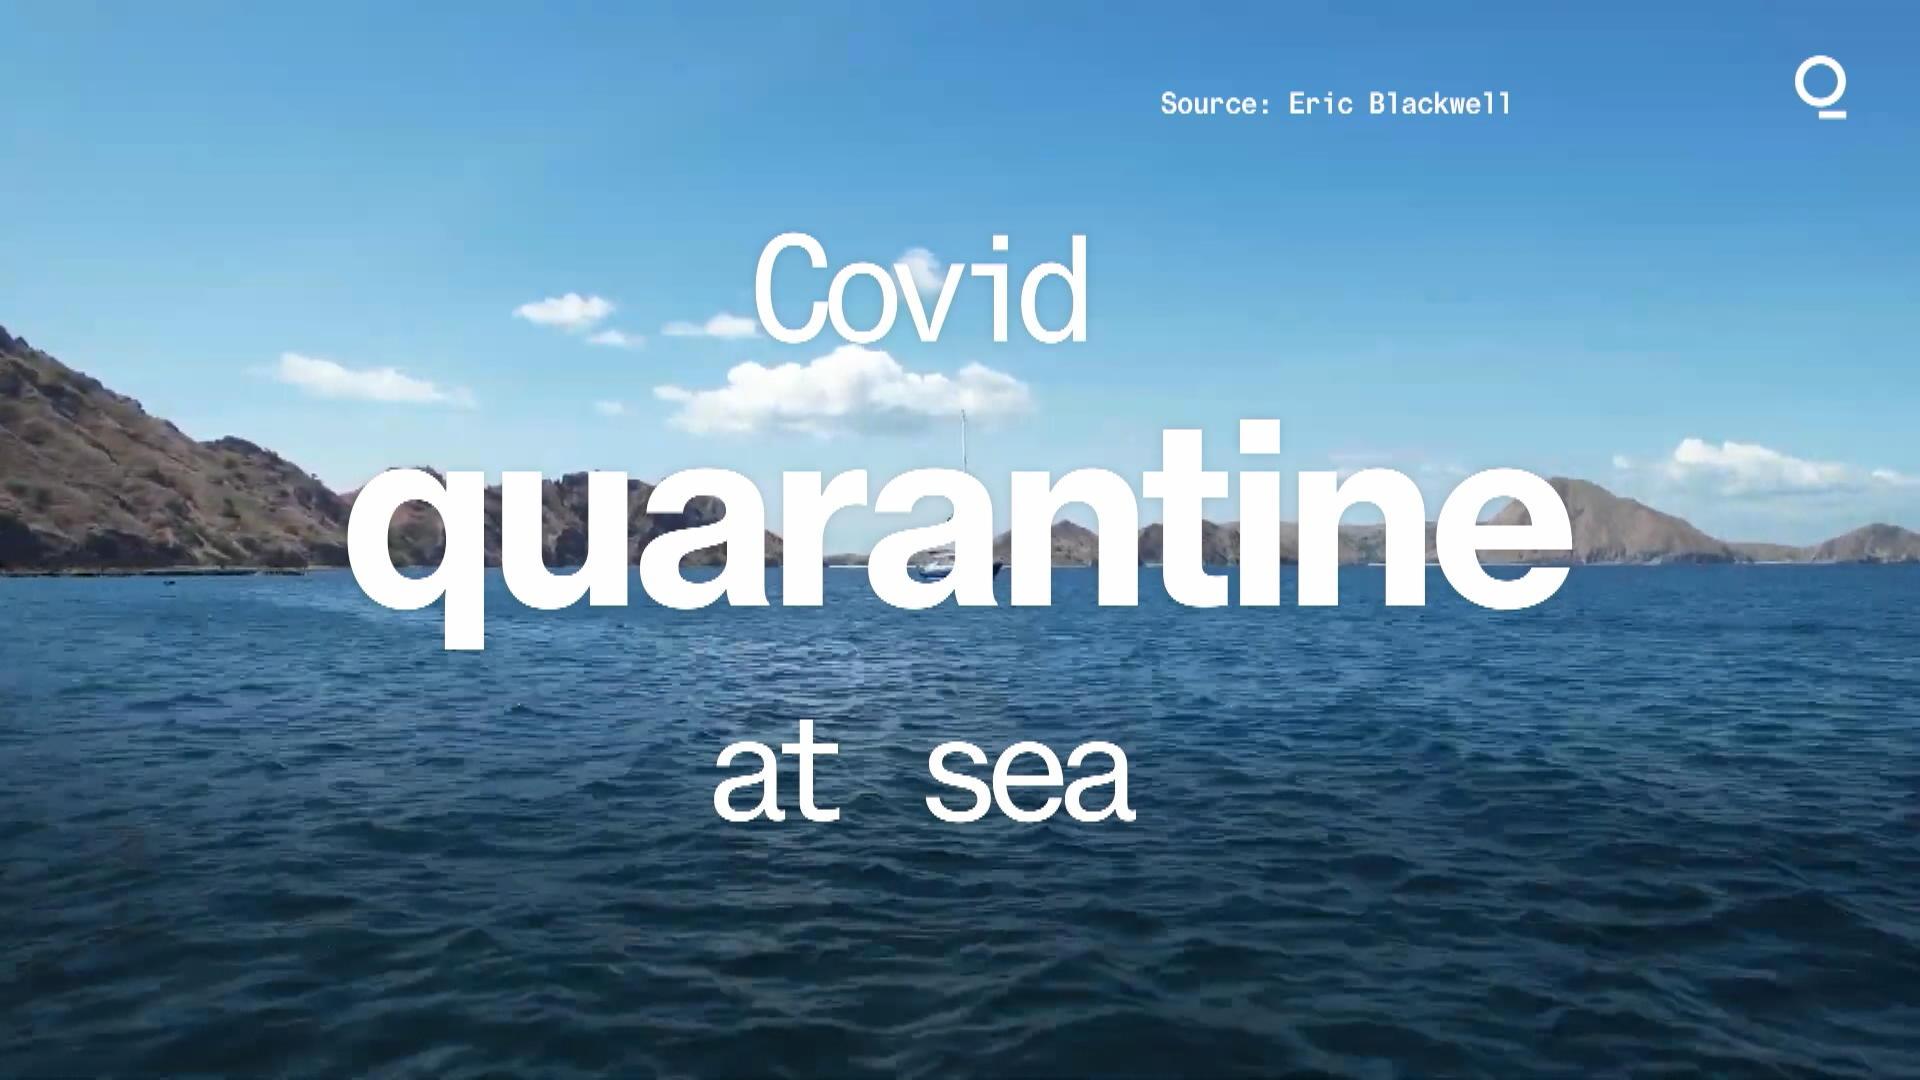 Two Kiwis Are Quarantining at Sea